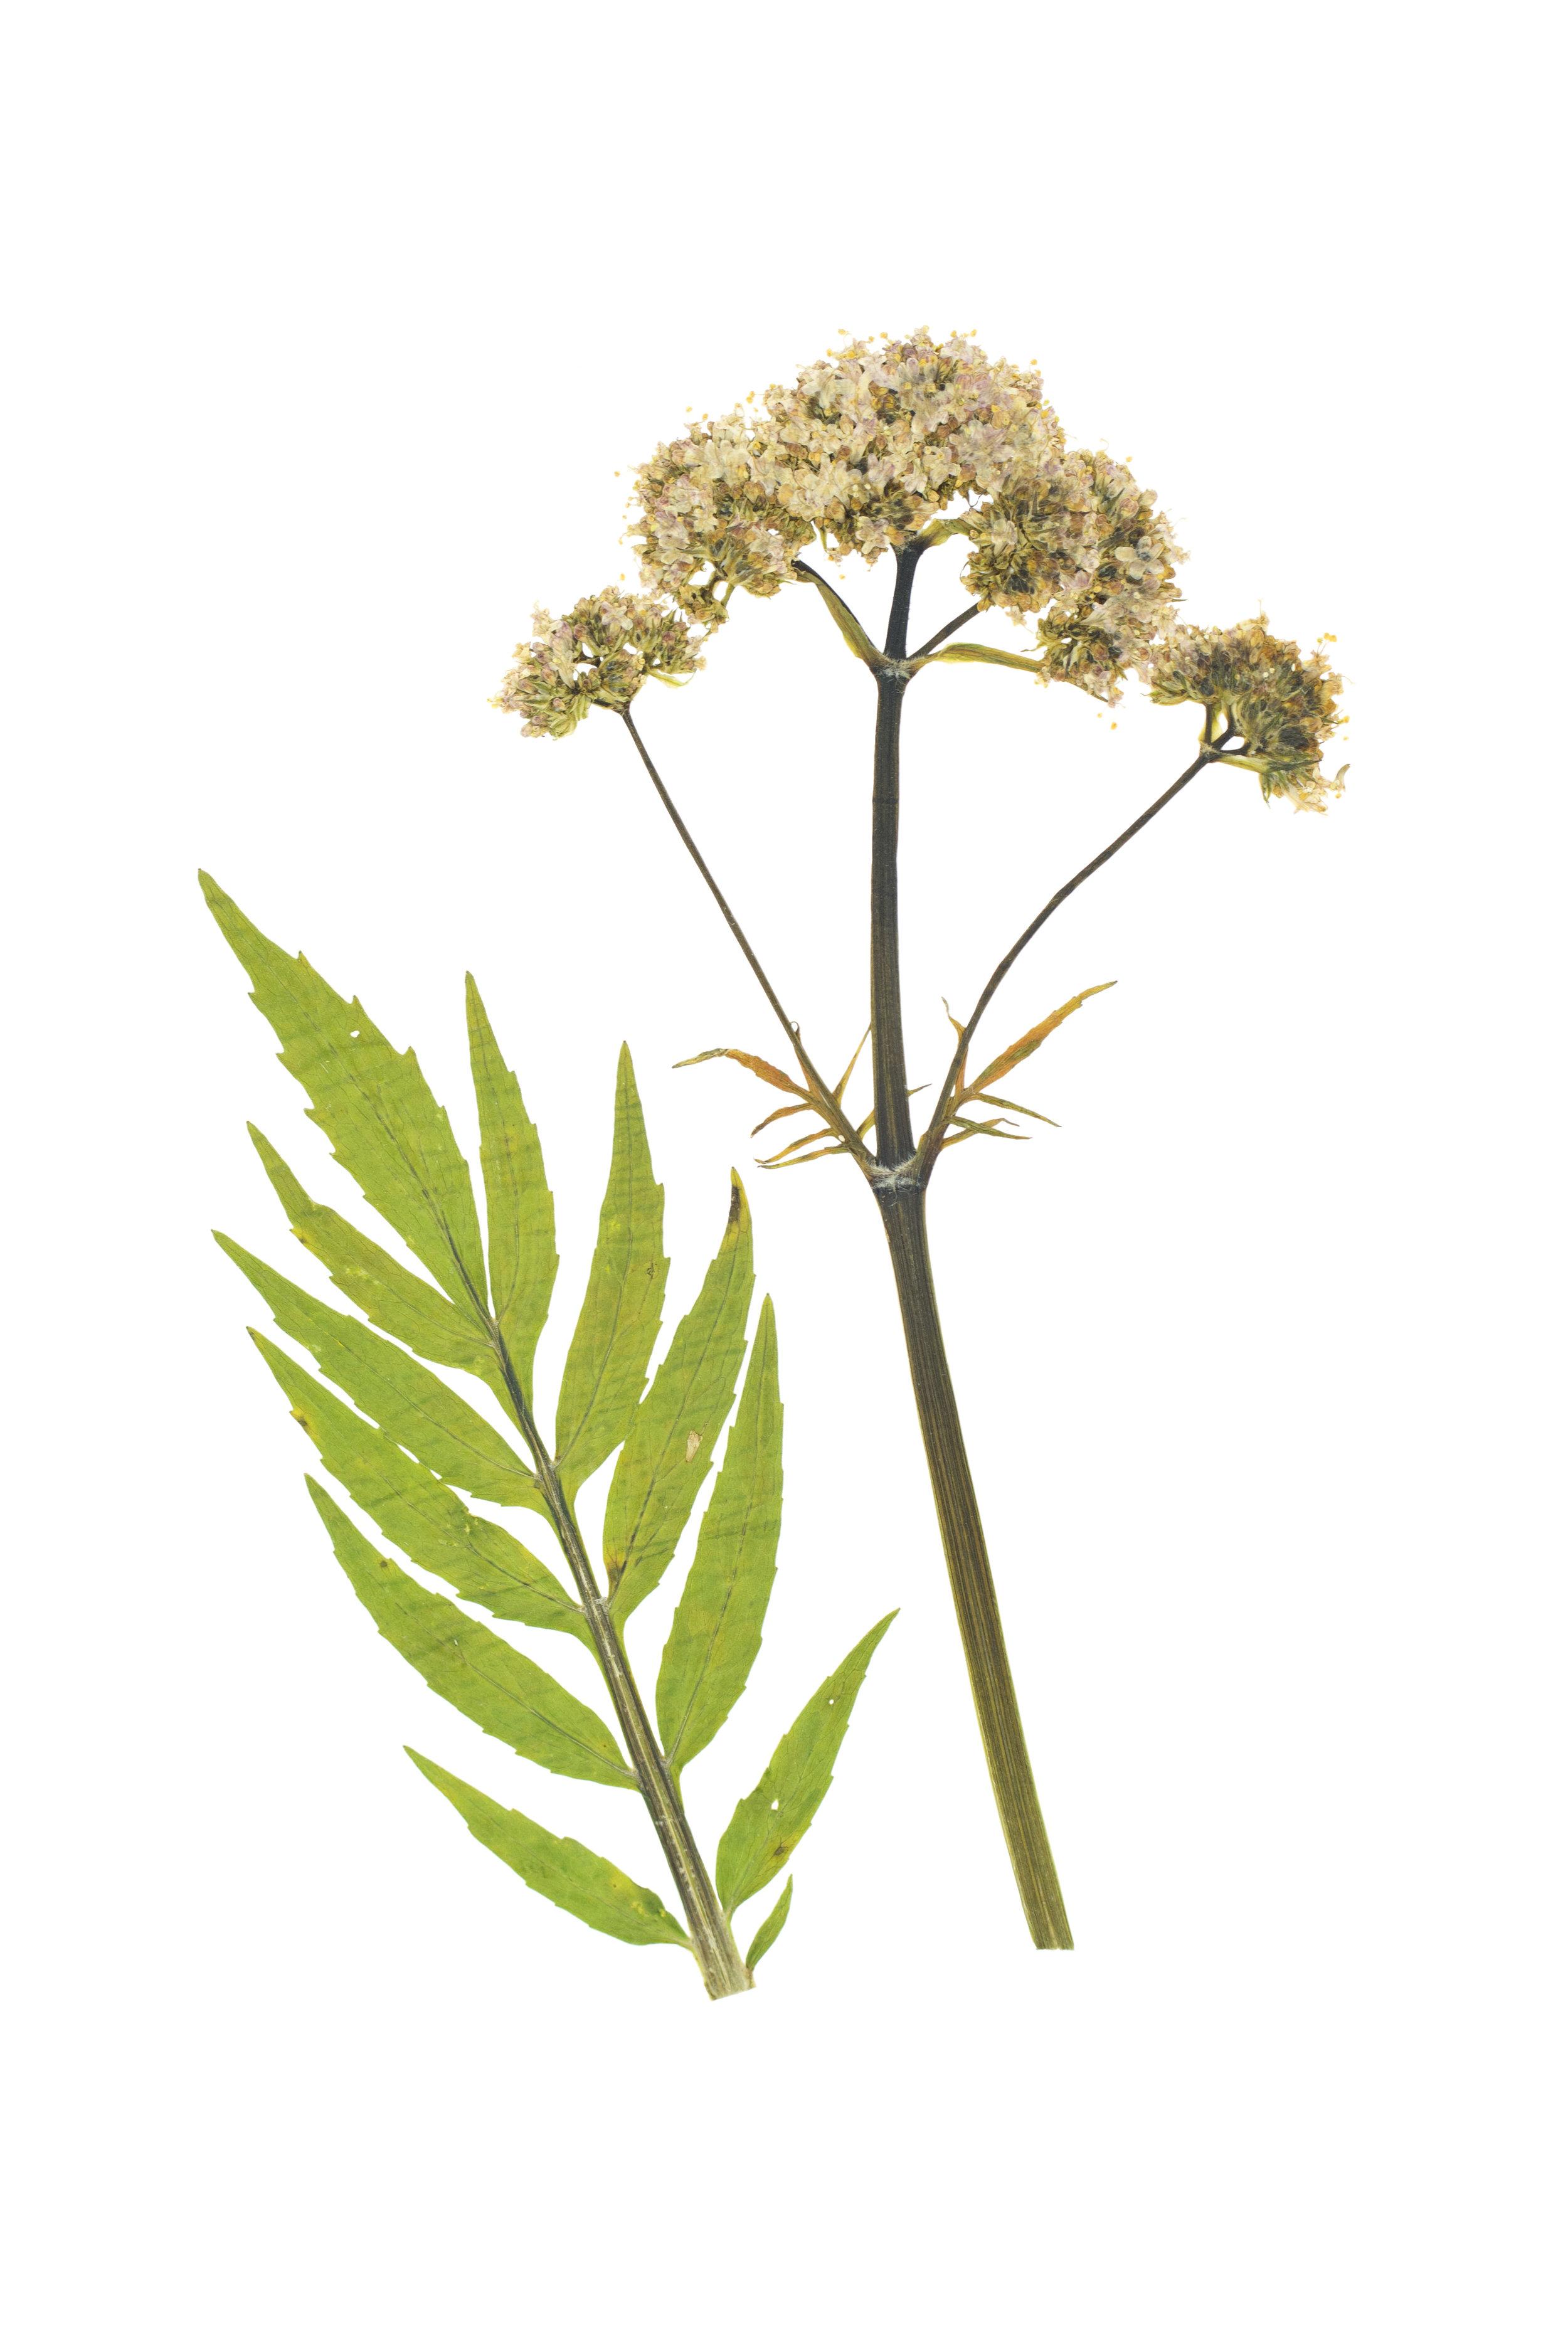 Valerian / Valeriana officinalis